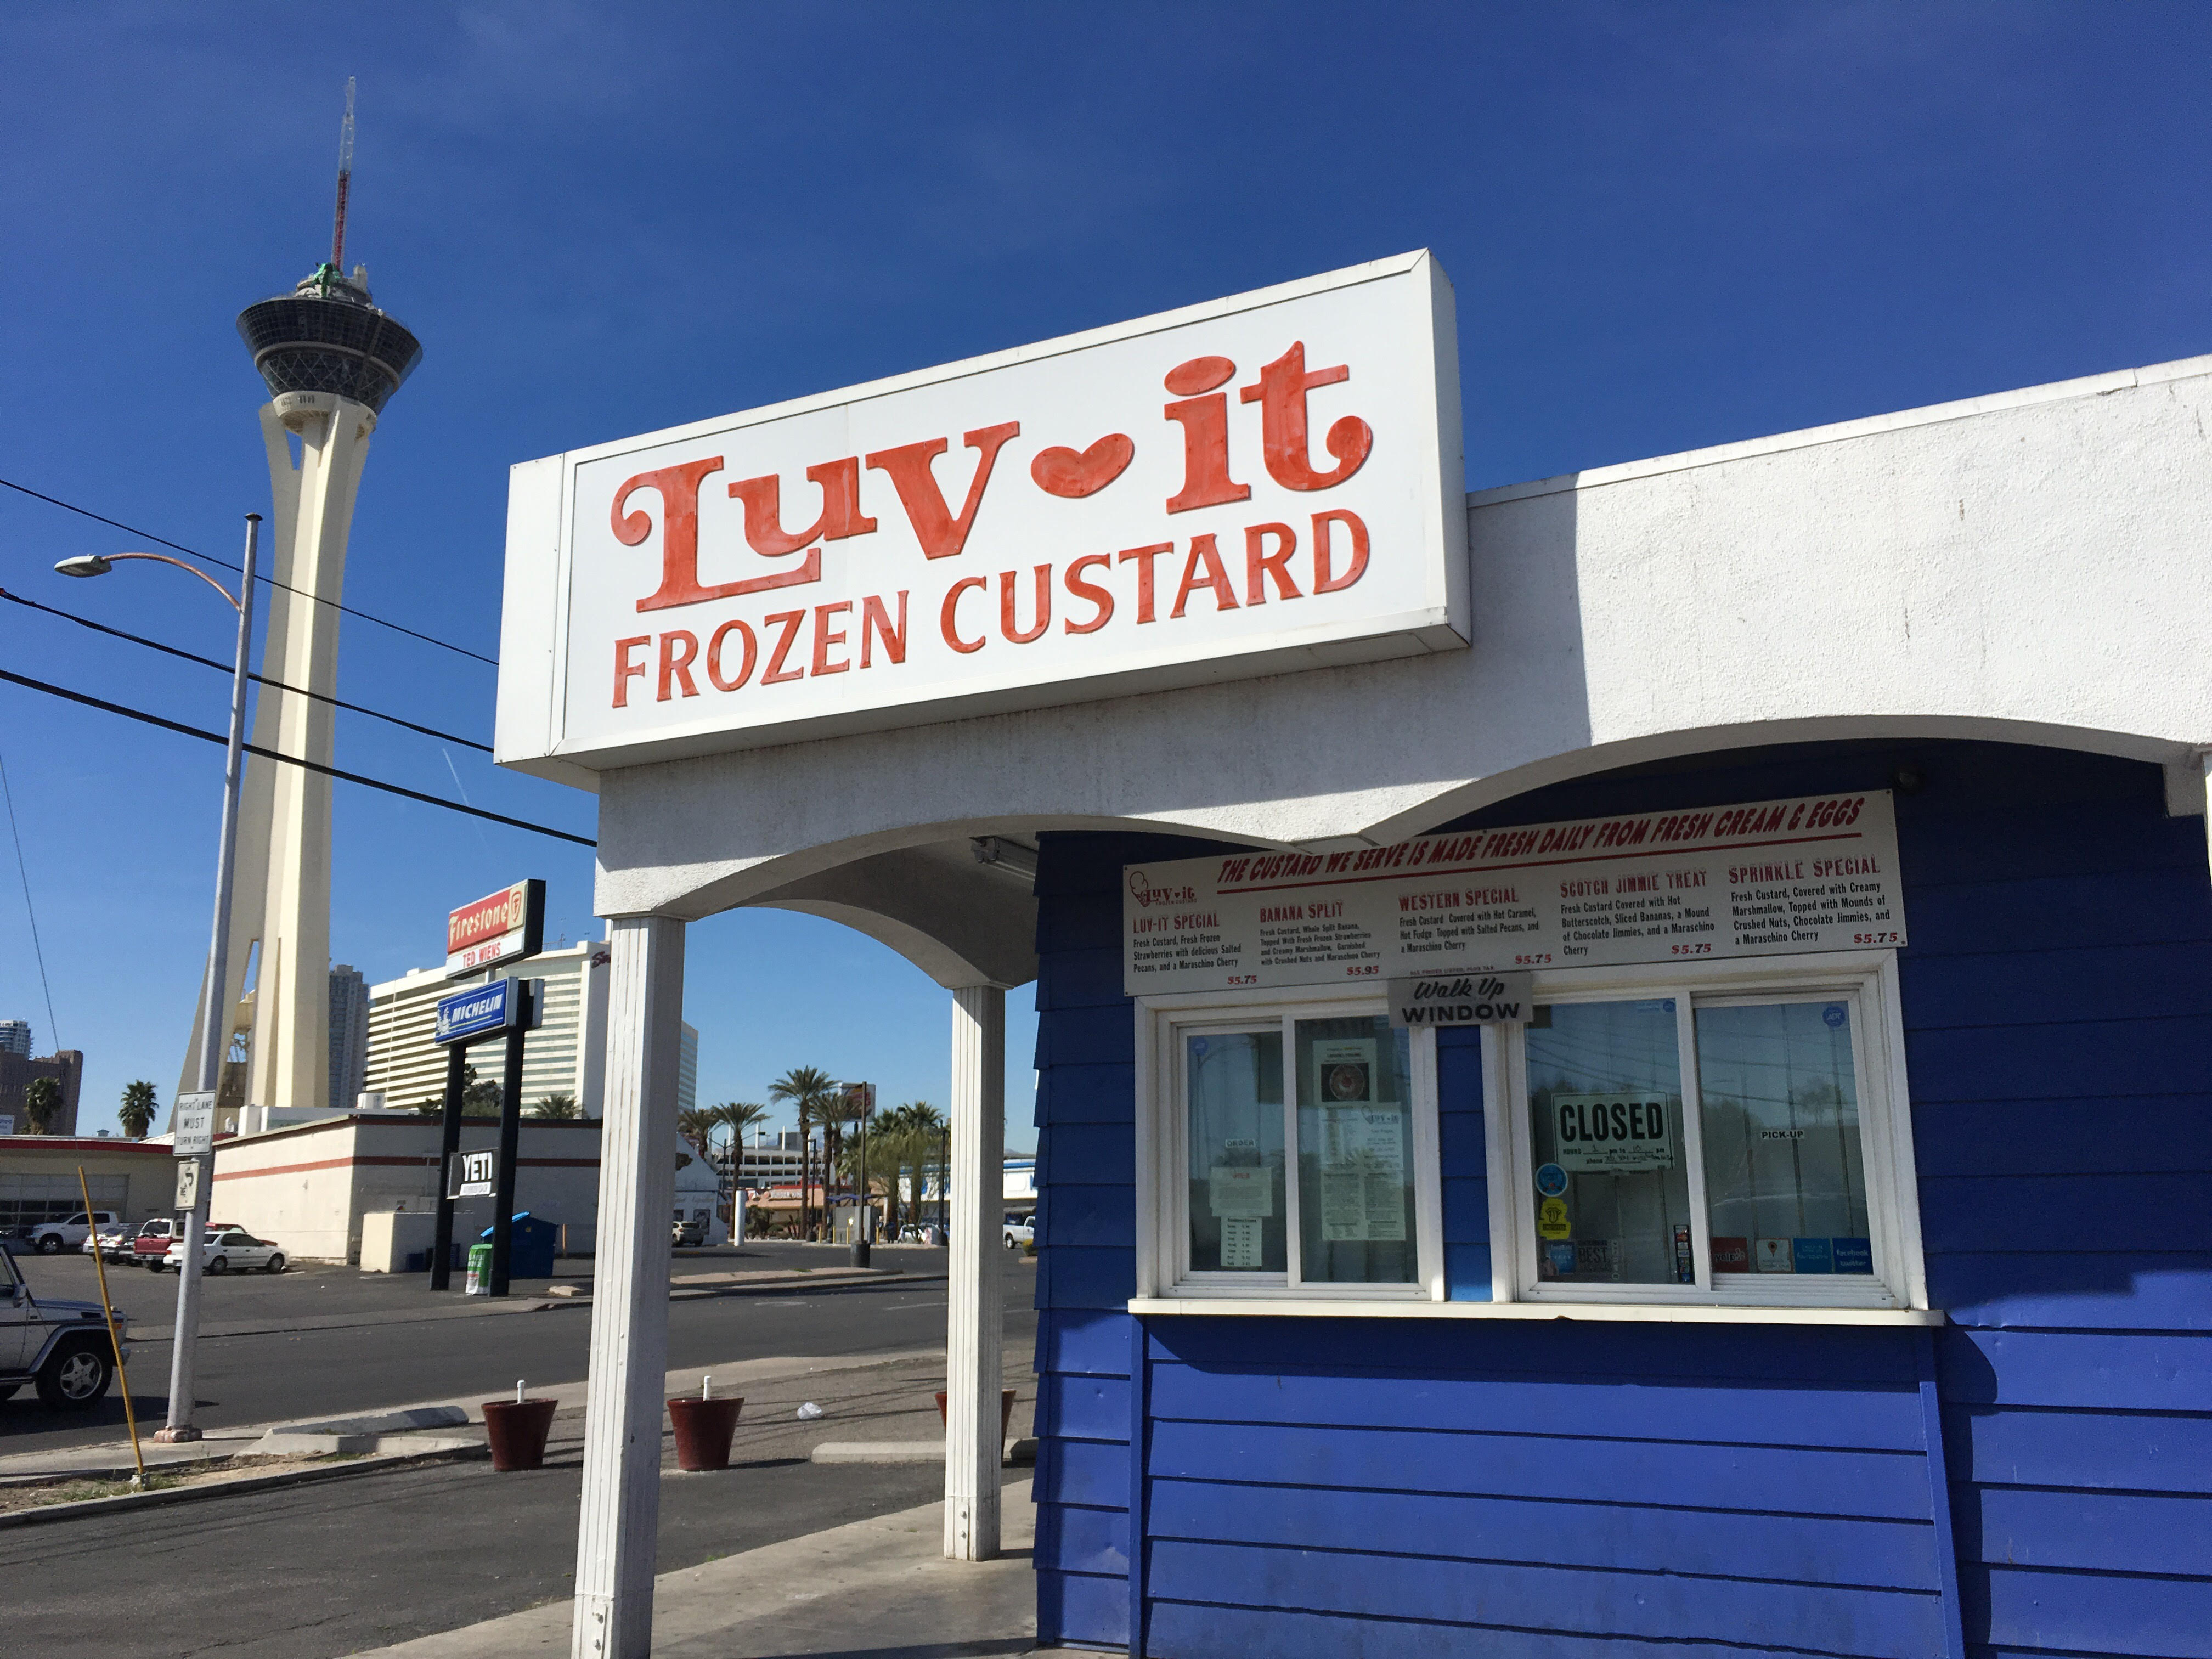 Frozen custard restaurant Las Vegas